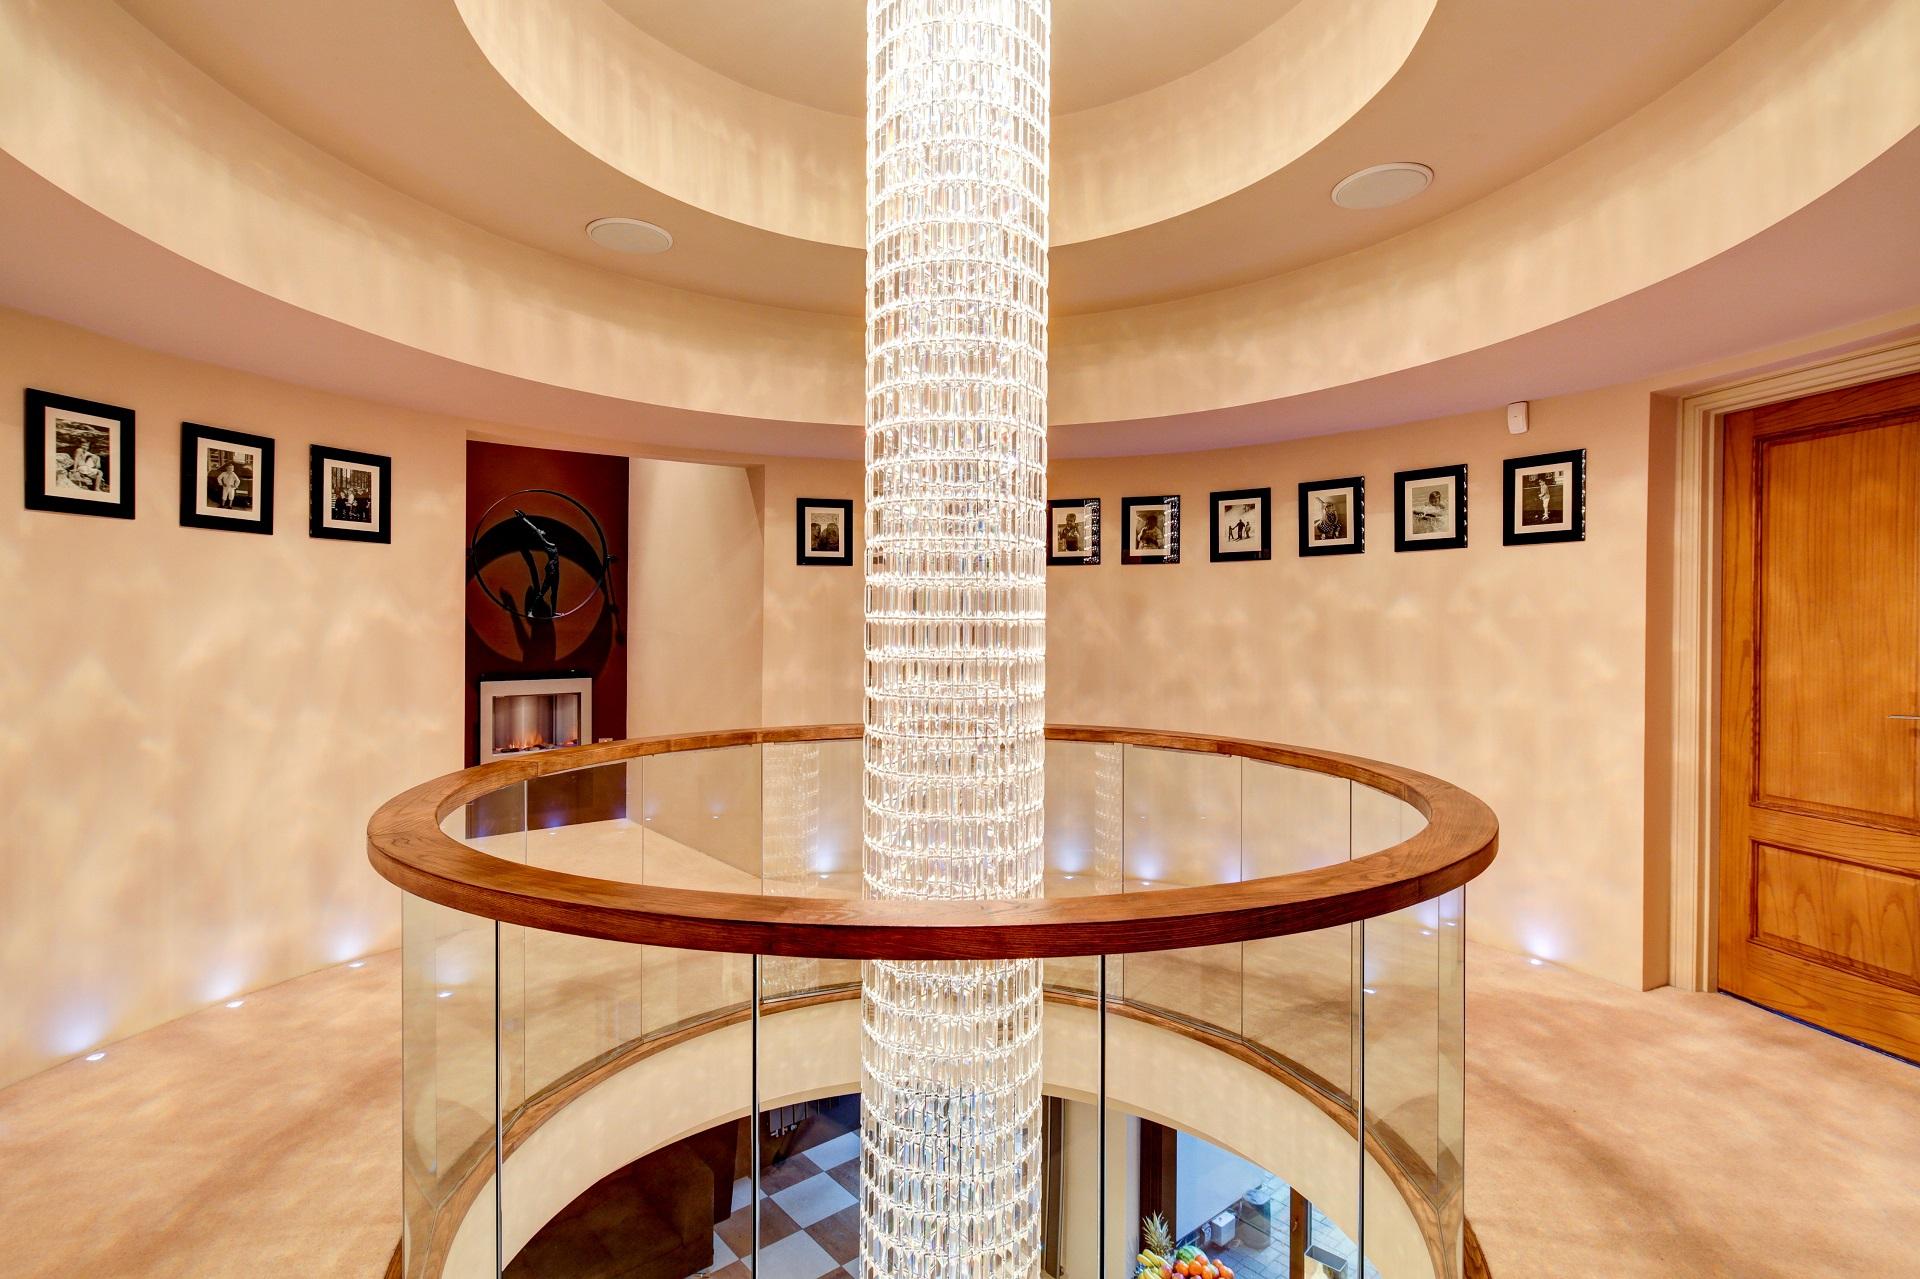 extravagant drop chandelier, luxury home nottingham, Cedar heights, home atrium